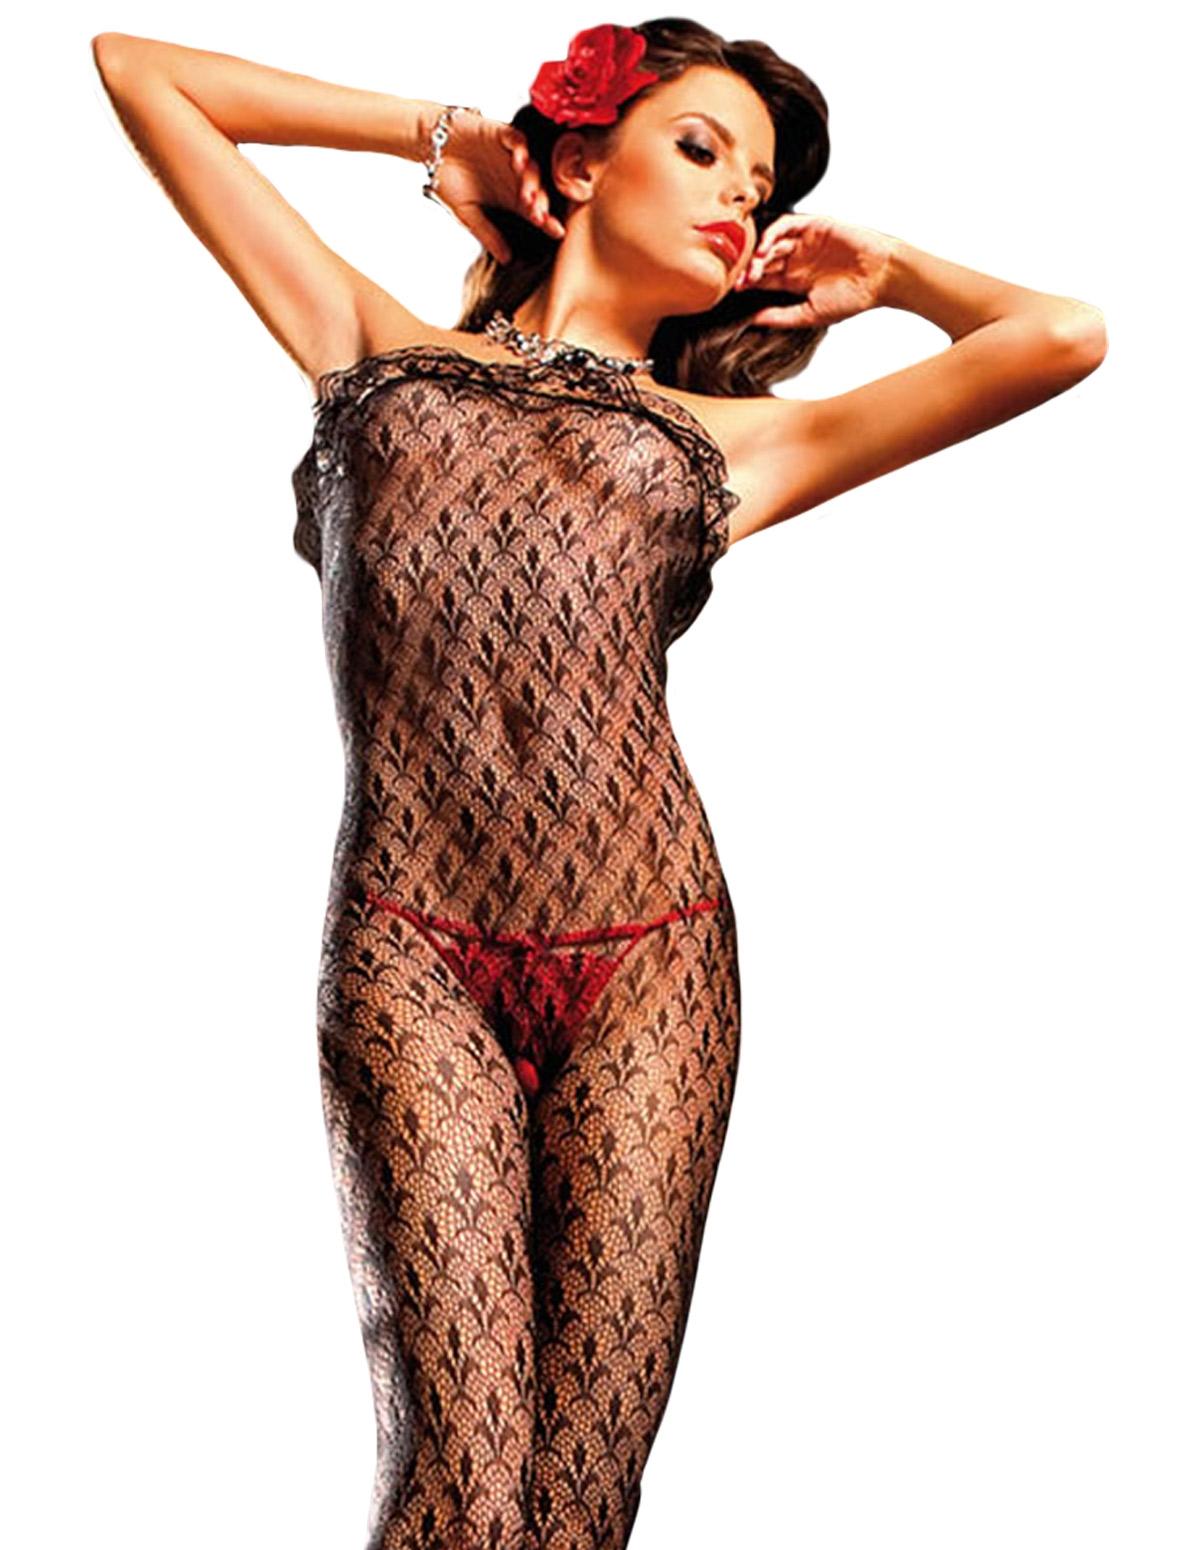 Strapless Ruffle Lace Bodystocking